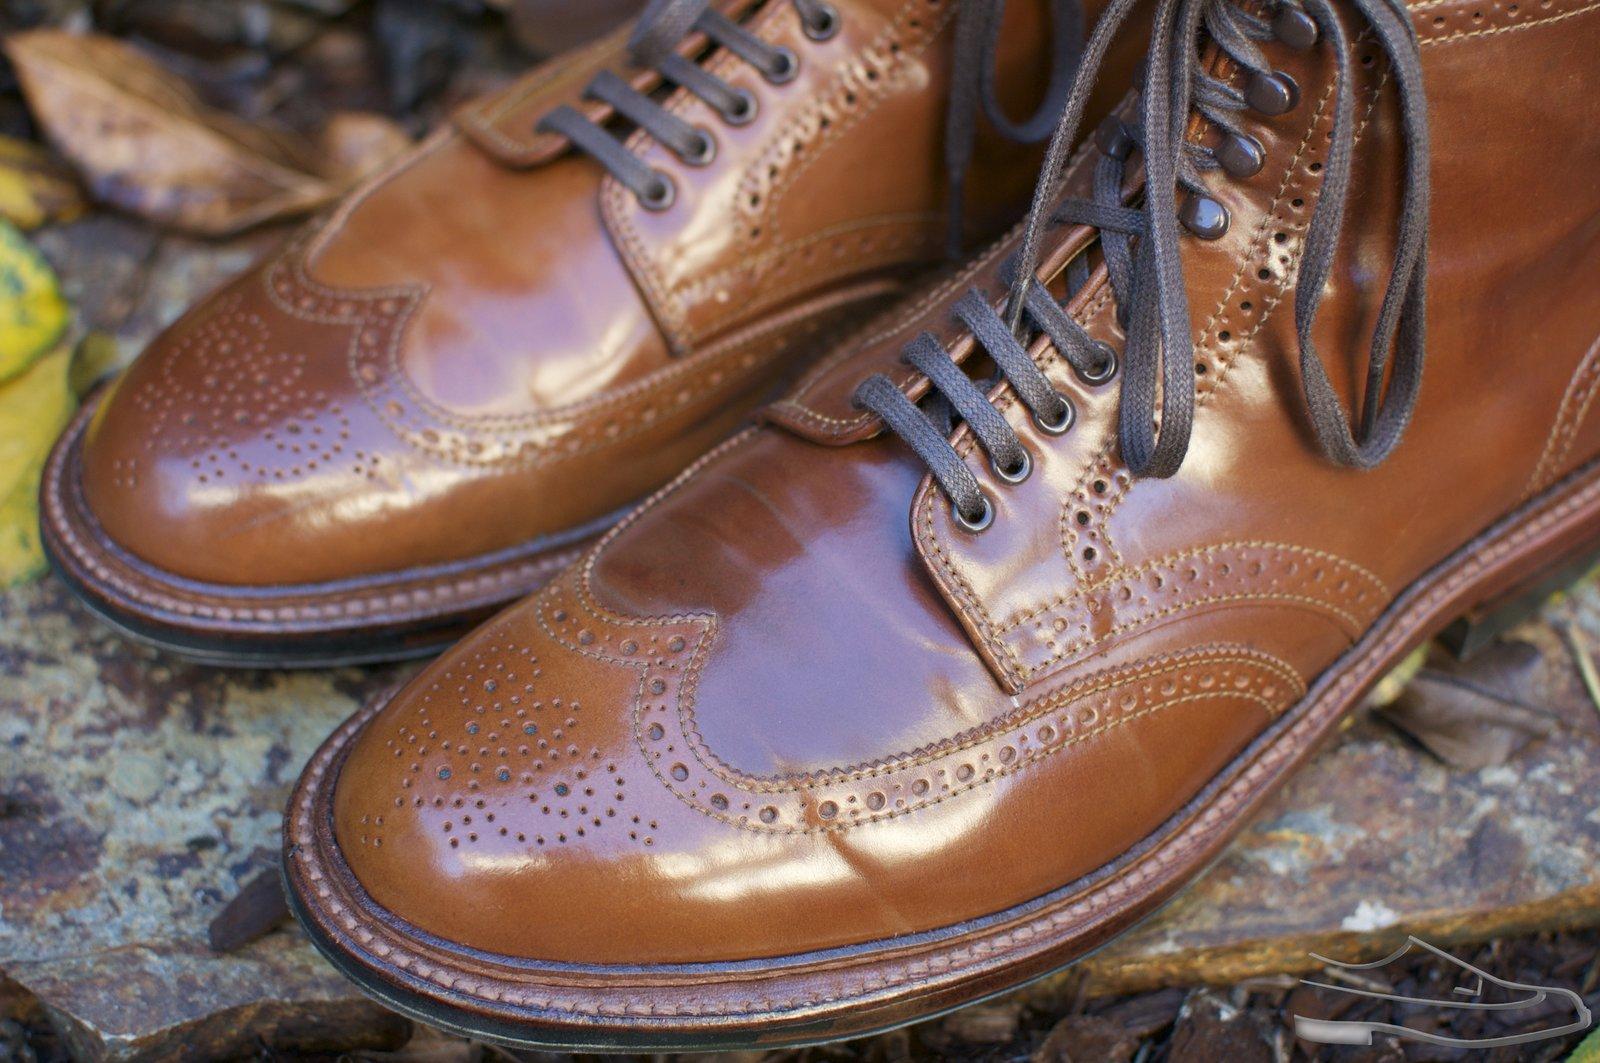 Alden Whiskey Shell Cordovan WT Boots - 2020-11-25 - 3.jpg